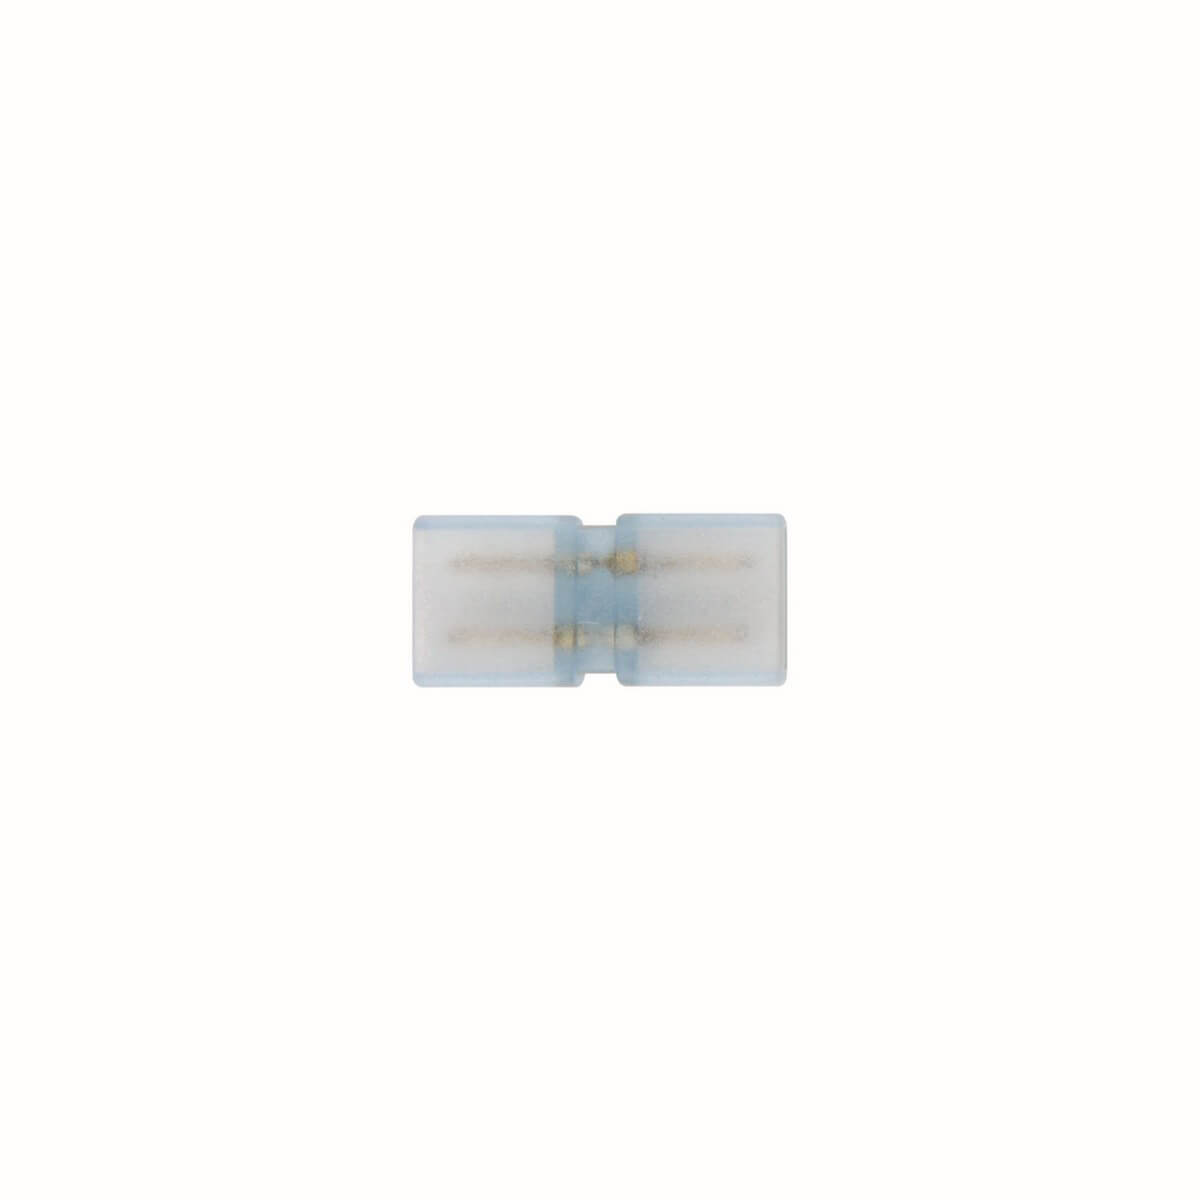 Клемма (10824) Uniel UTC-K-12/A67-NNN Clear 005 Polybag стоимость